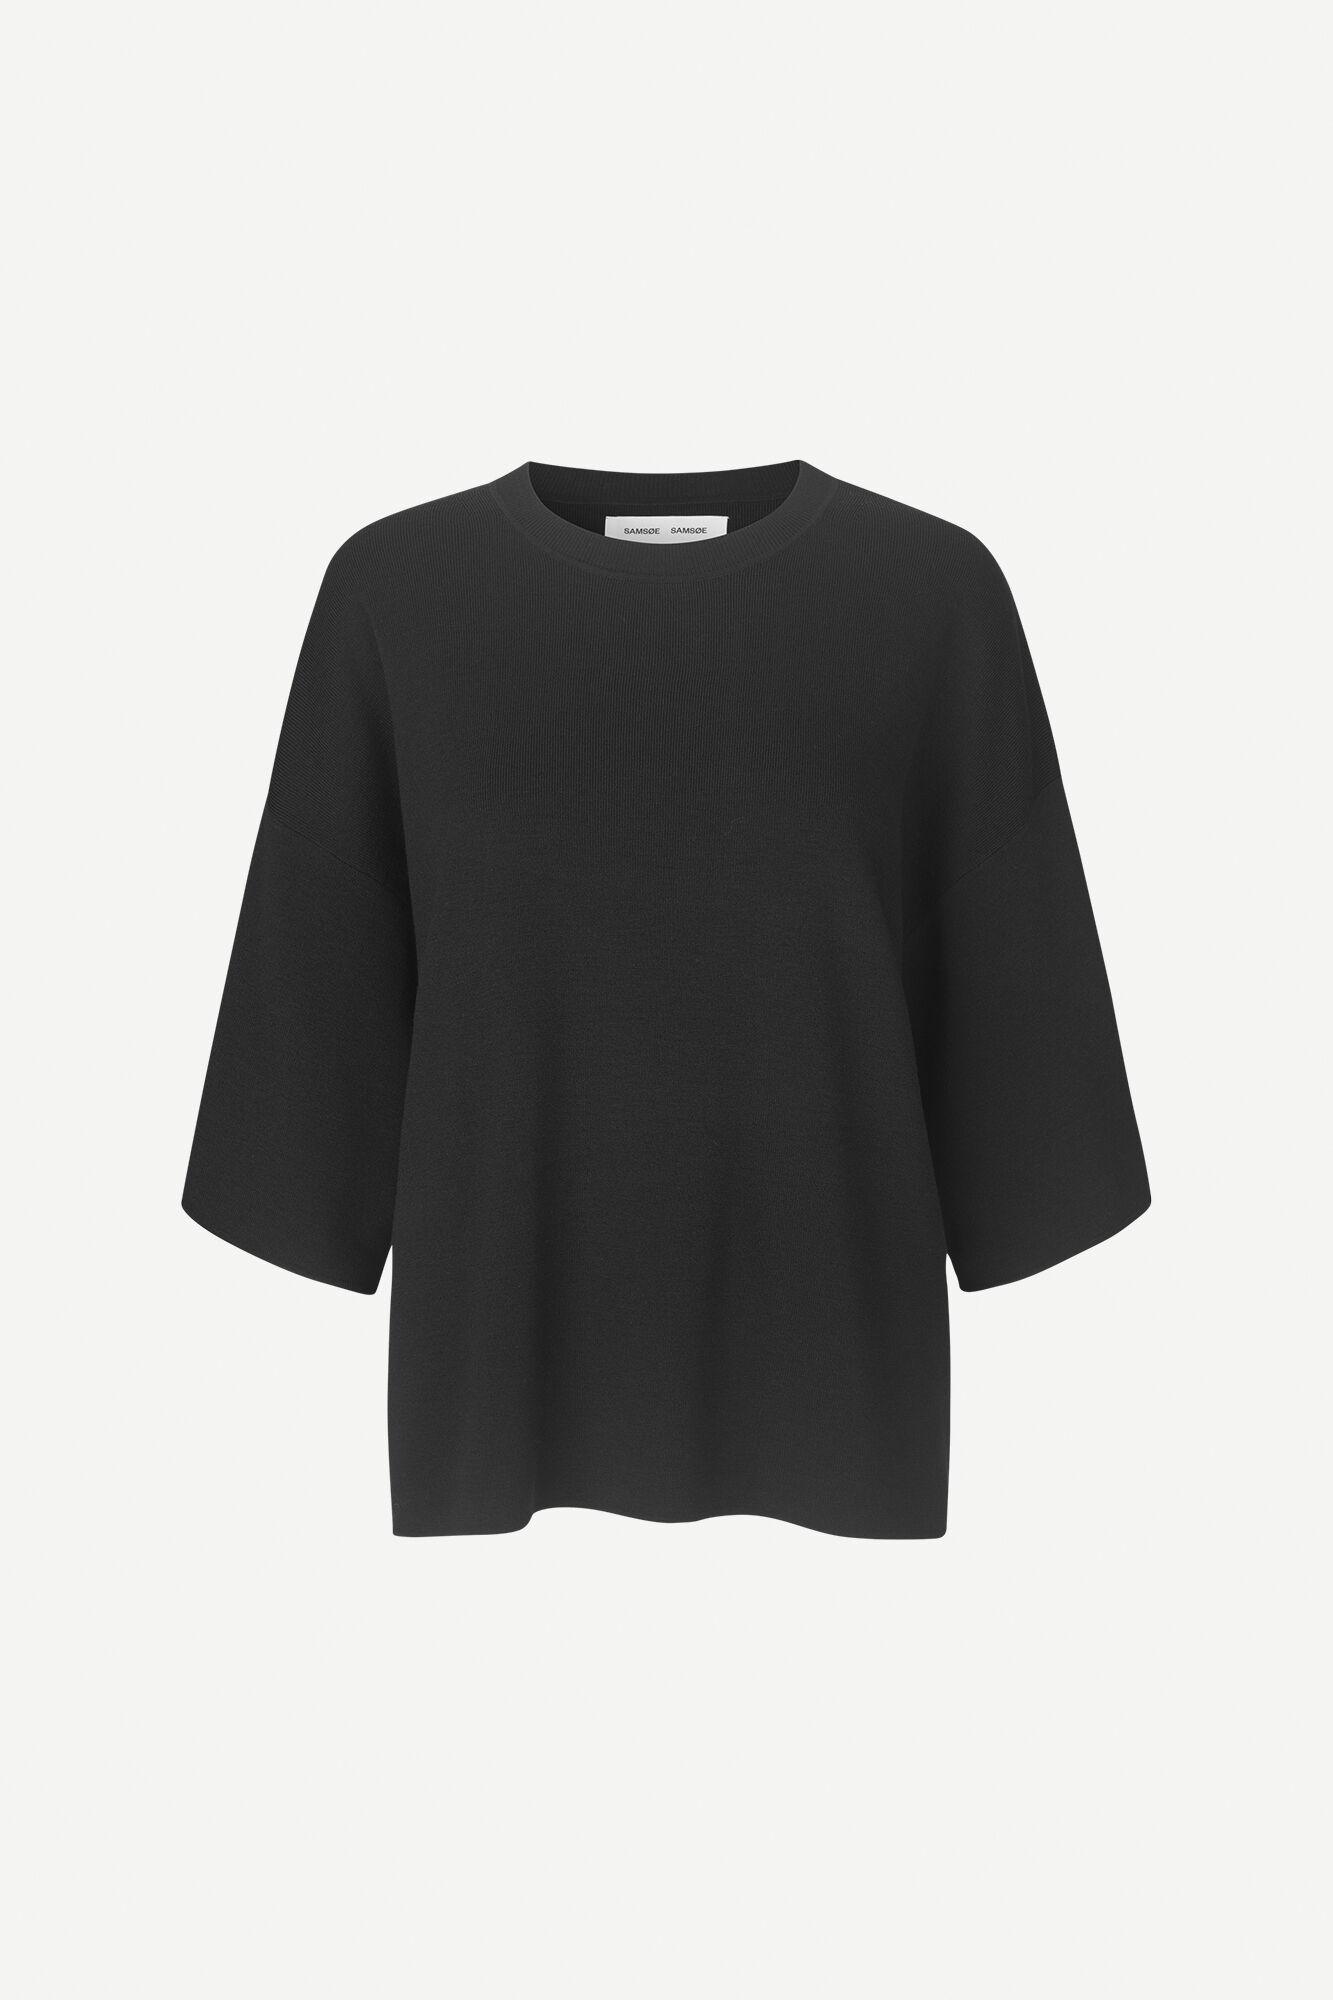 Lenka t-shirt 12748, BLACK